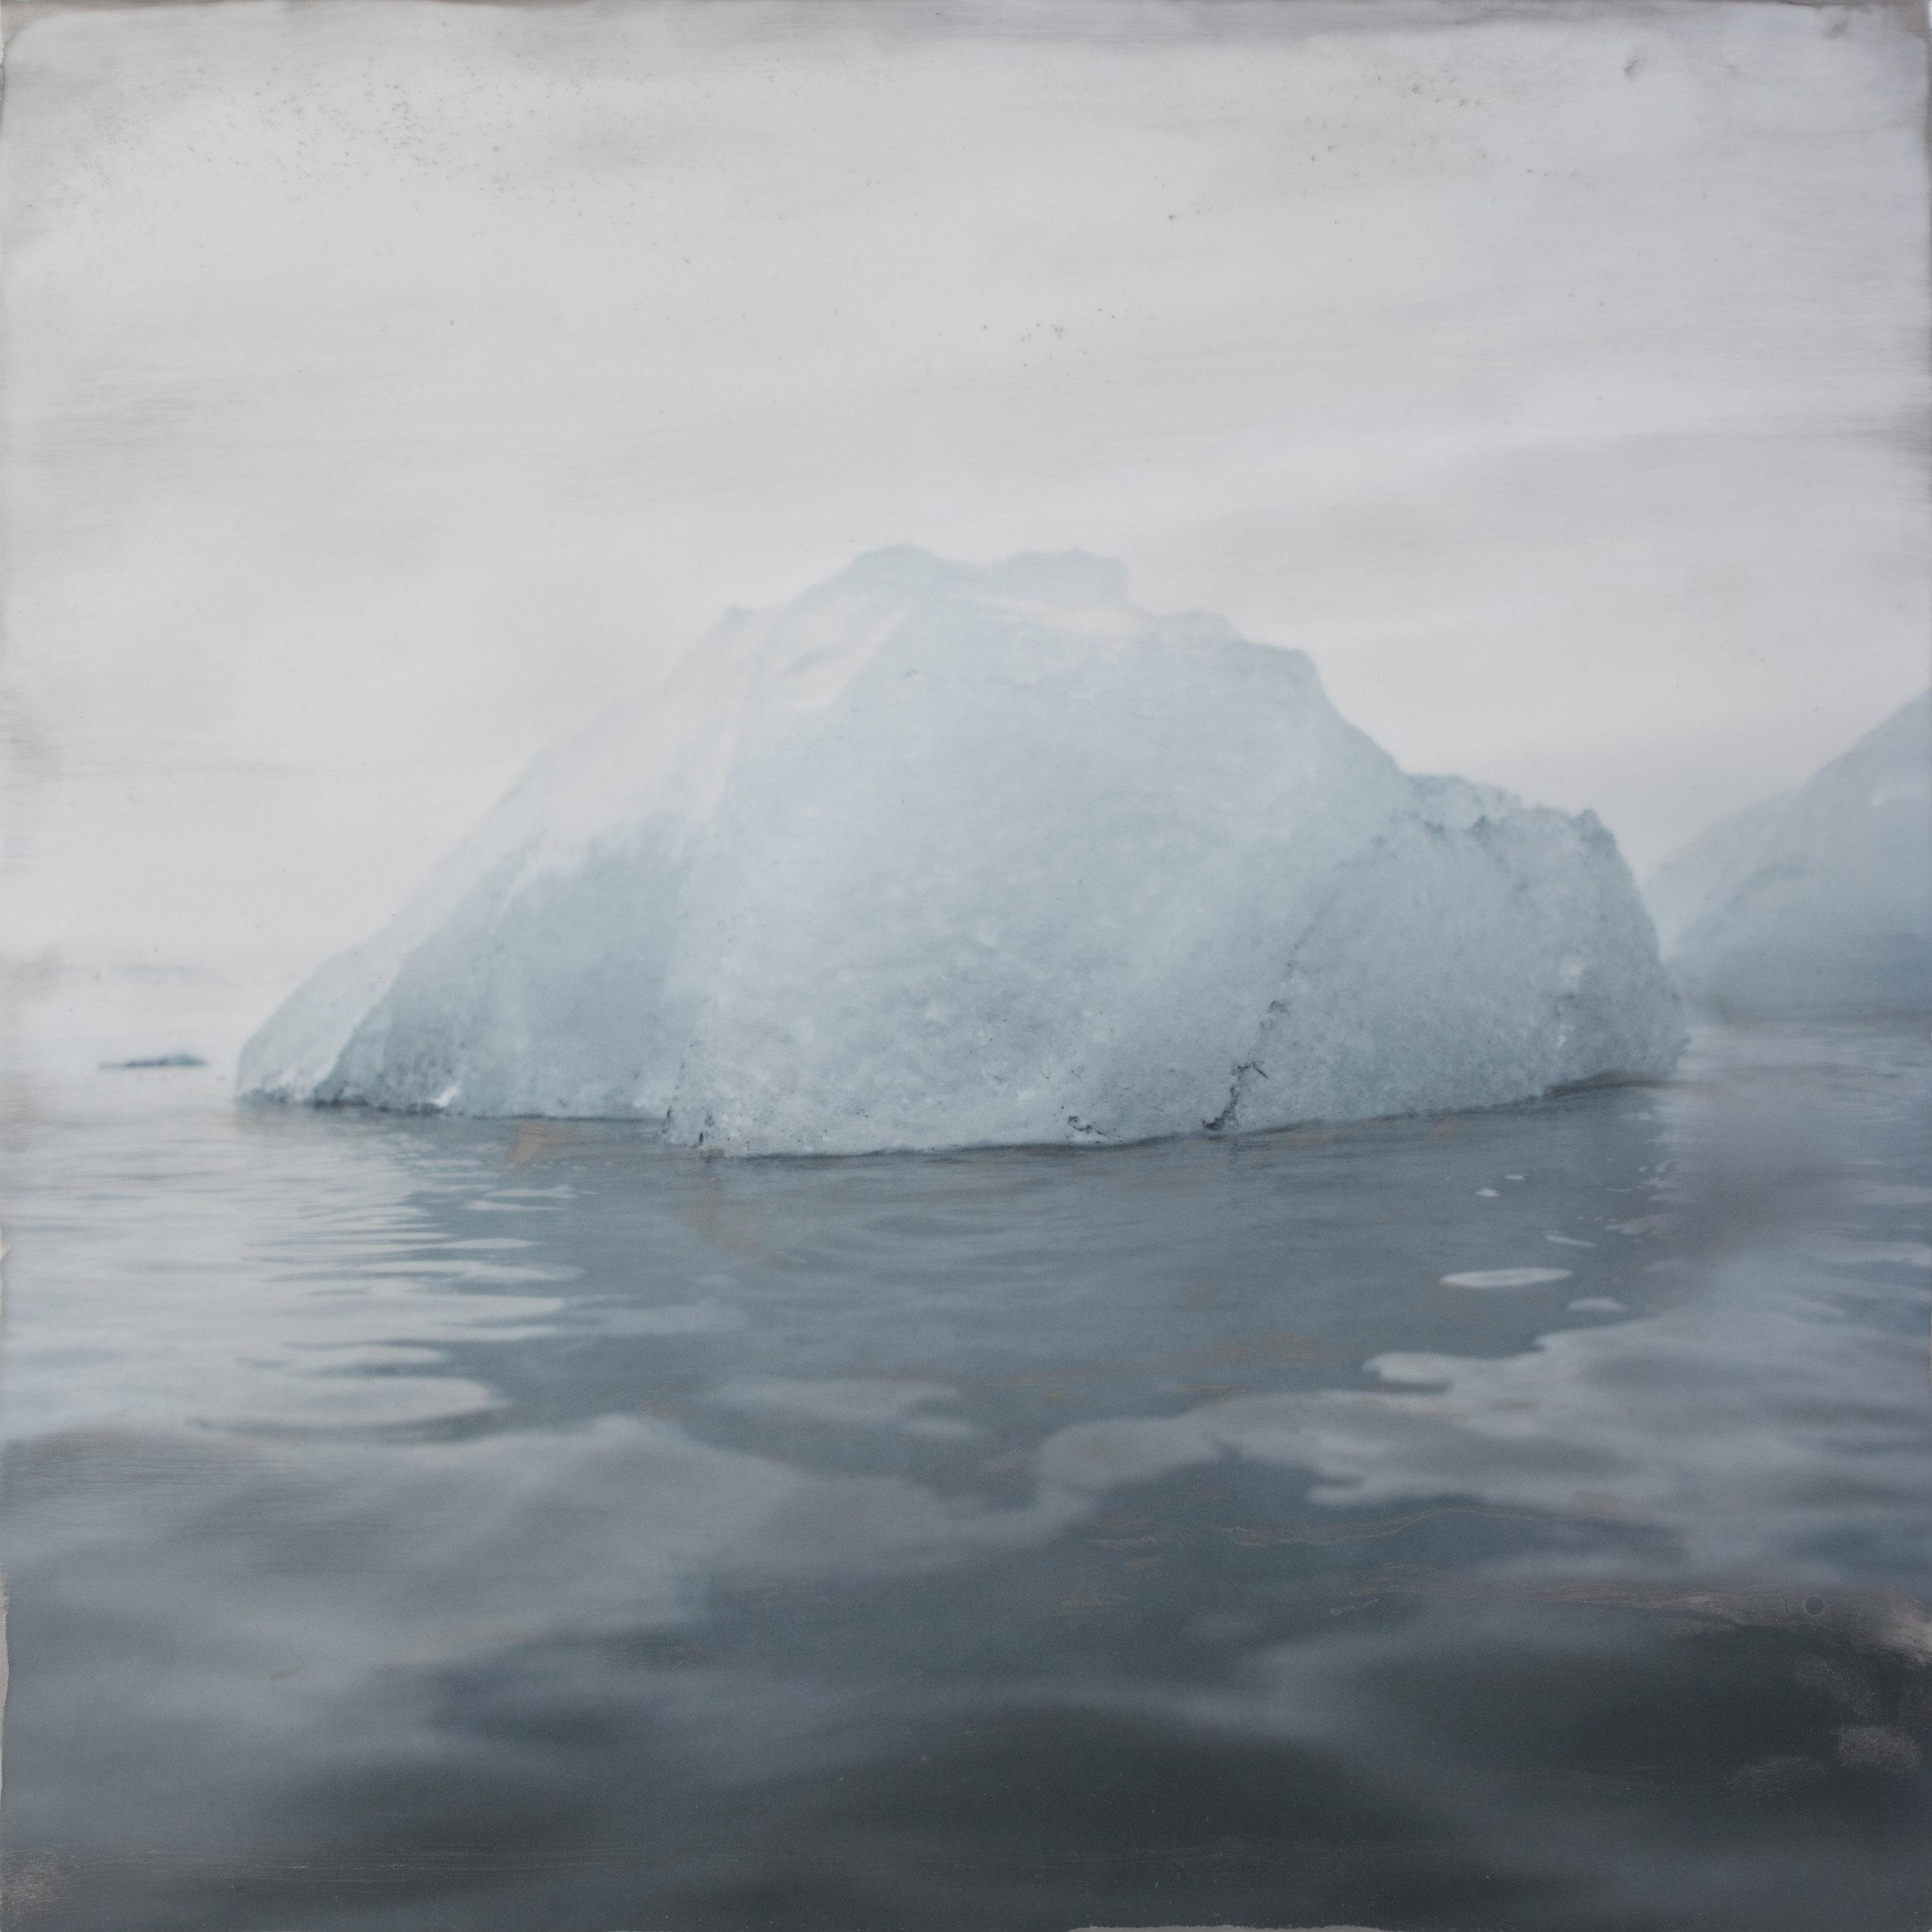 Julibukta Glacier Ice